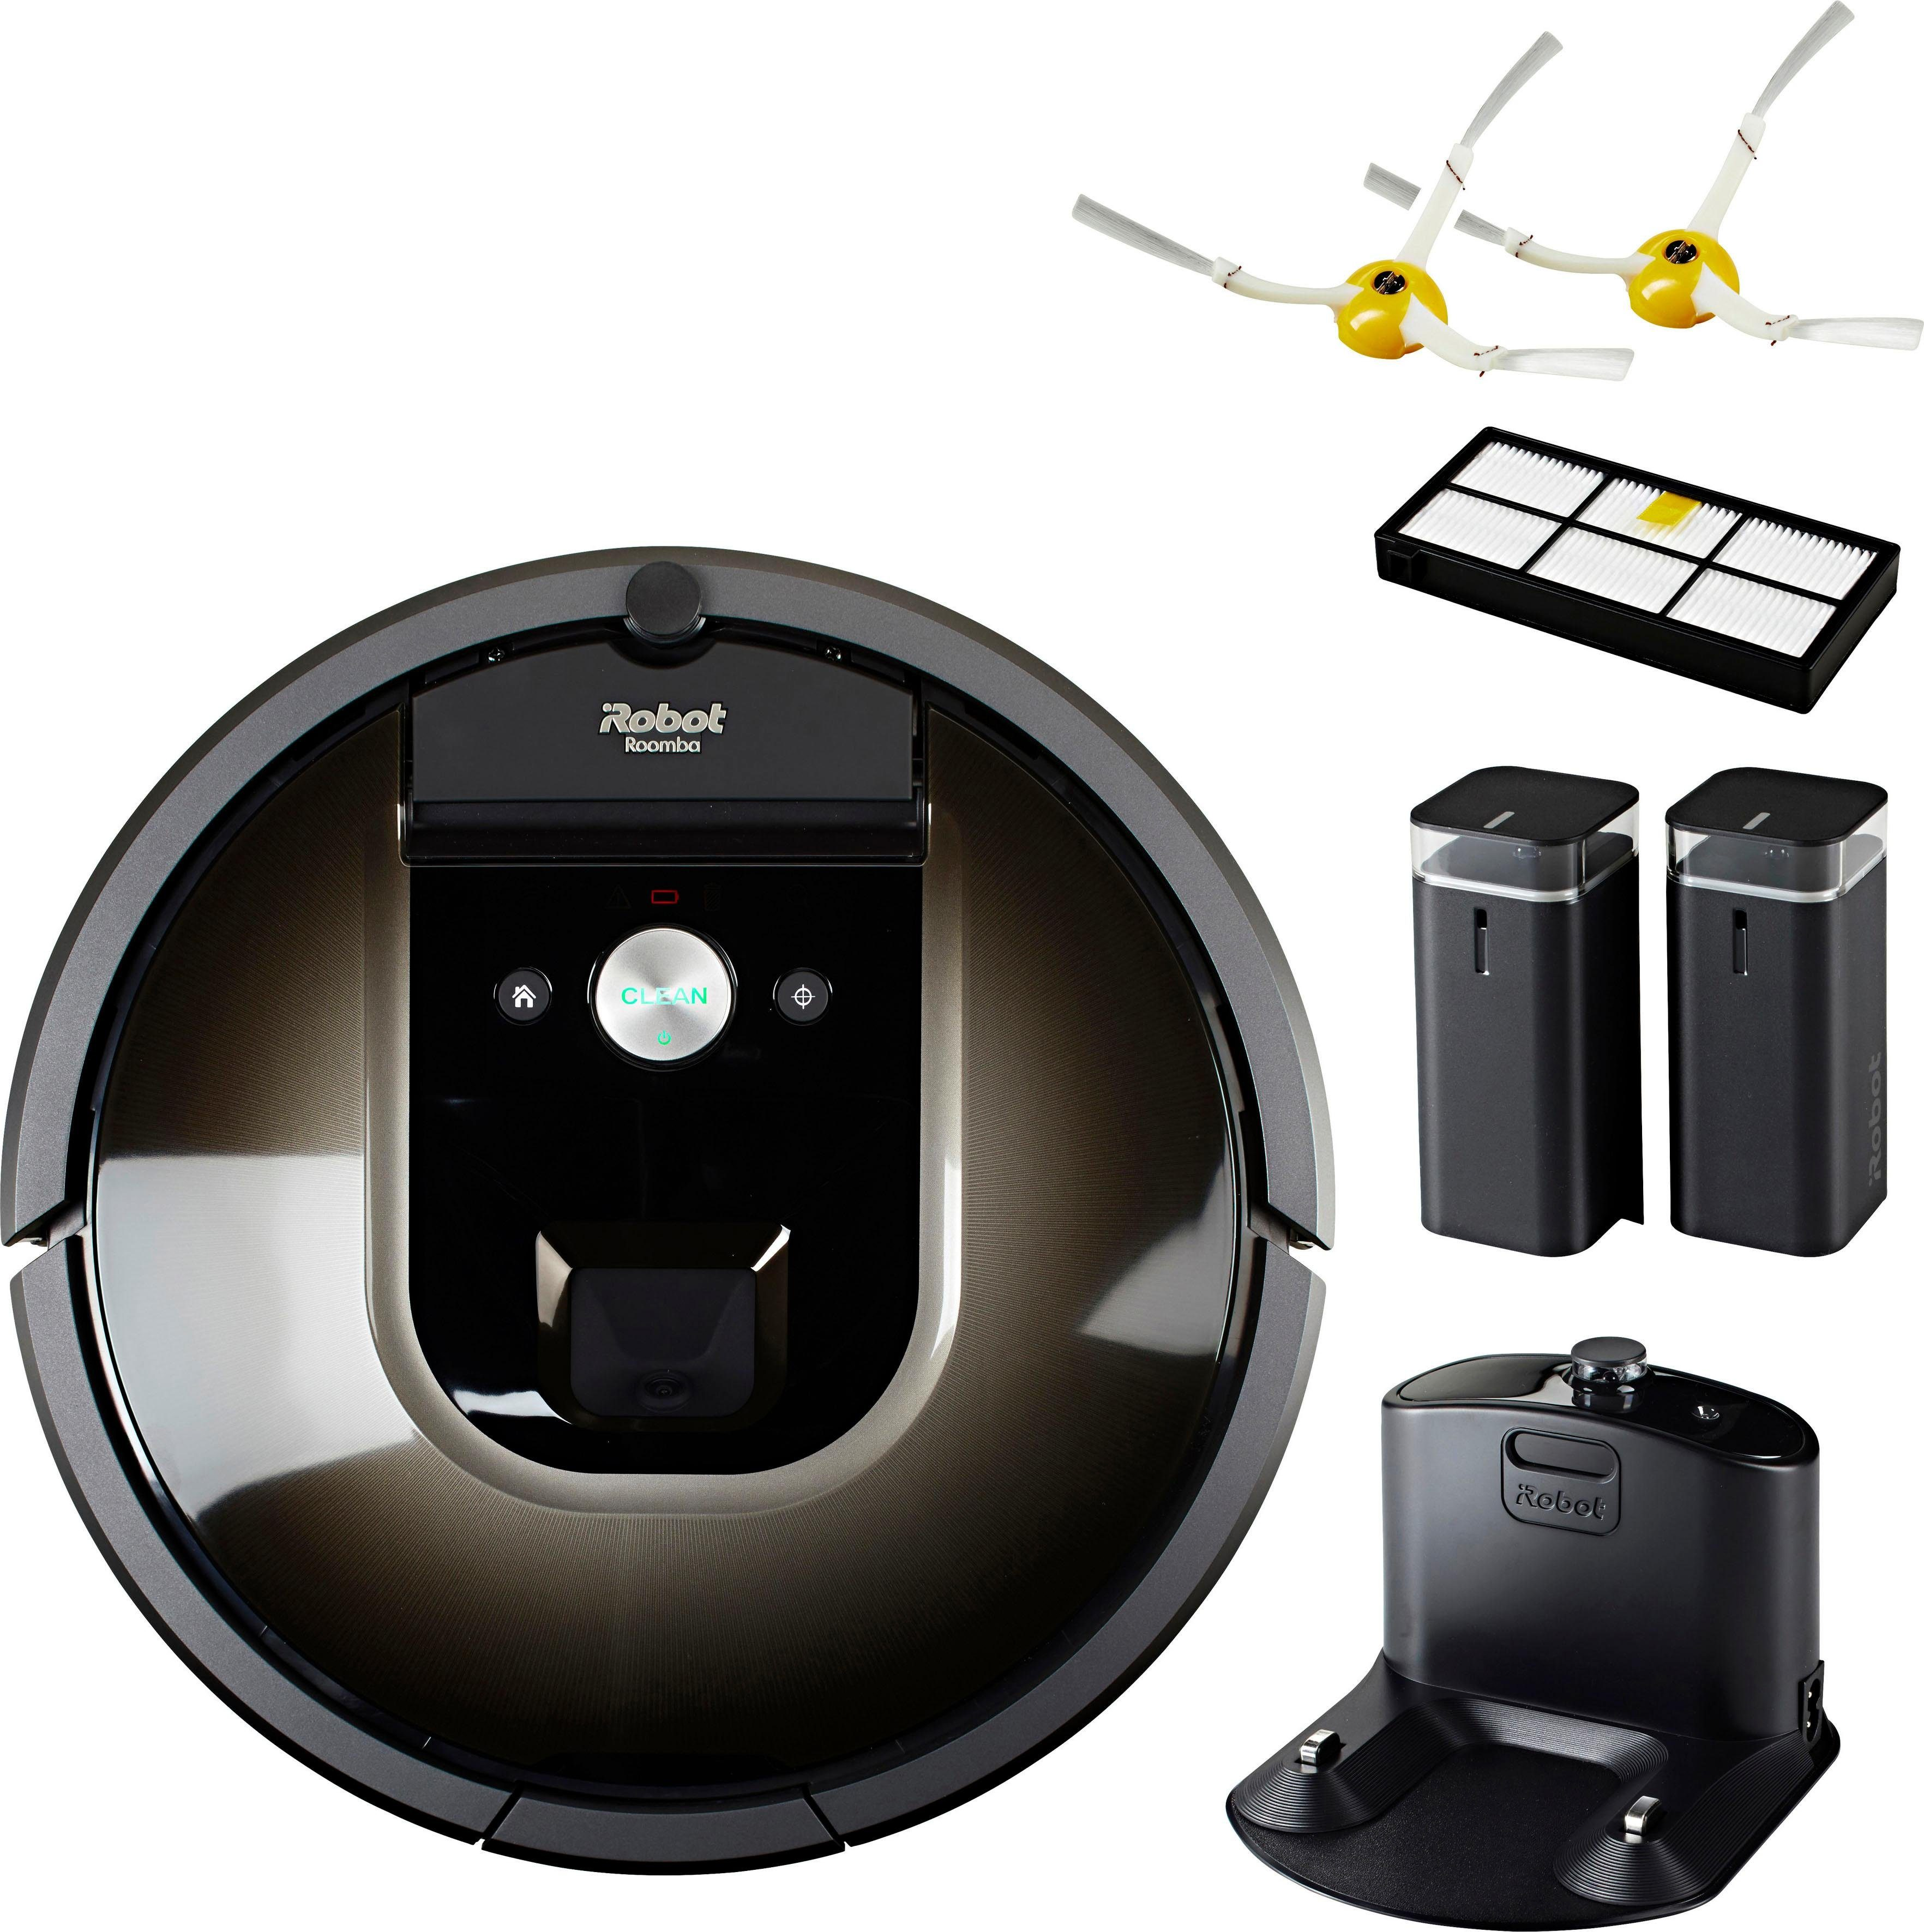 iRobot Saugroboter Roomba 980, beutellos, App-fähig